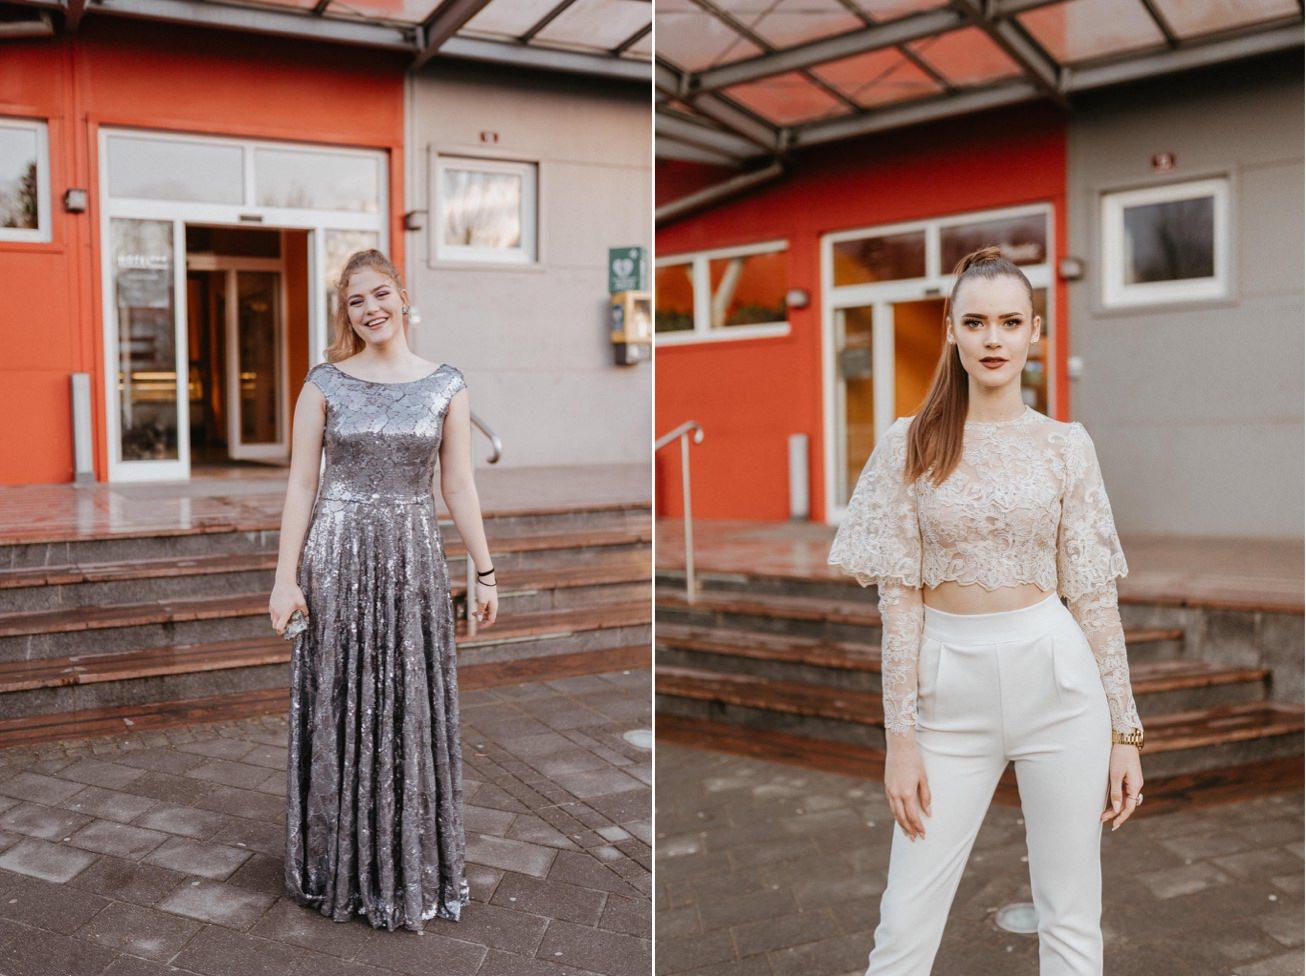 Hotel Dolenjc Maturantski ples fotograf 11